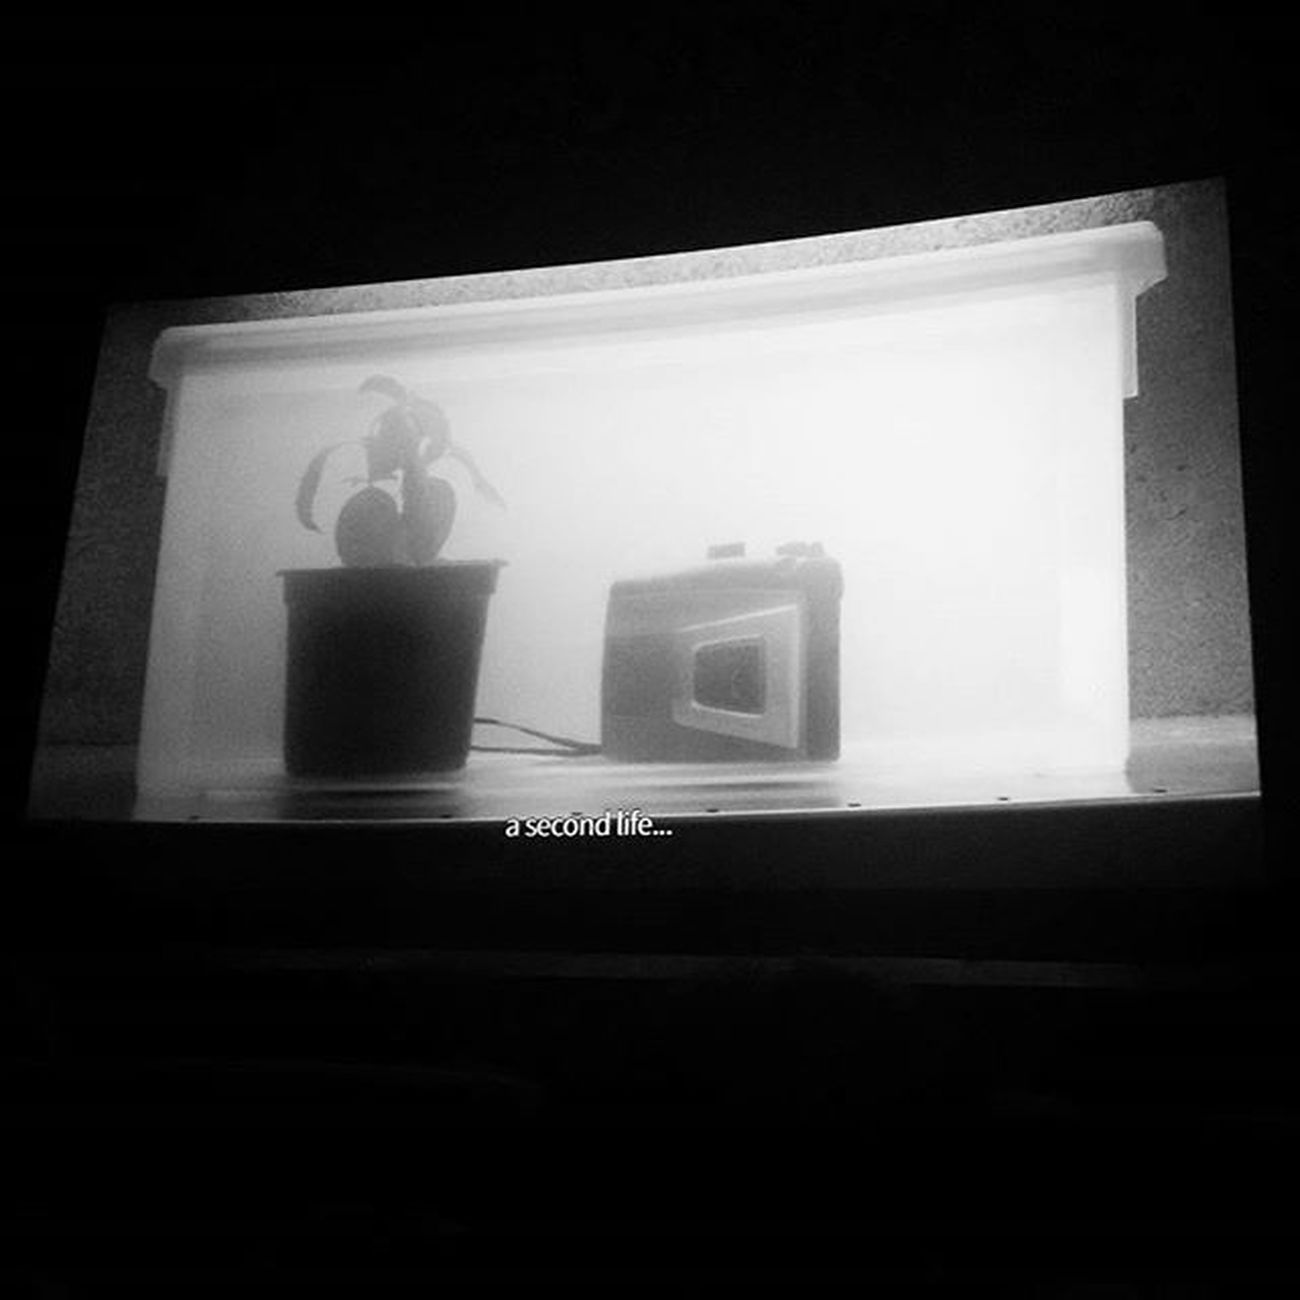 Cinema Music Recorder Plant Tunisia IgersTunisia Jcc2015 عيشة أخرى ... بالموسيقى :) و لله اﻷمر من قبل و من بعد :)